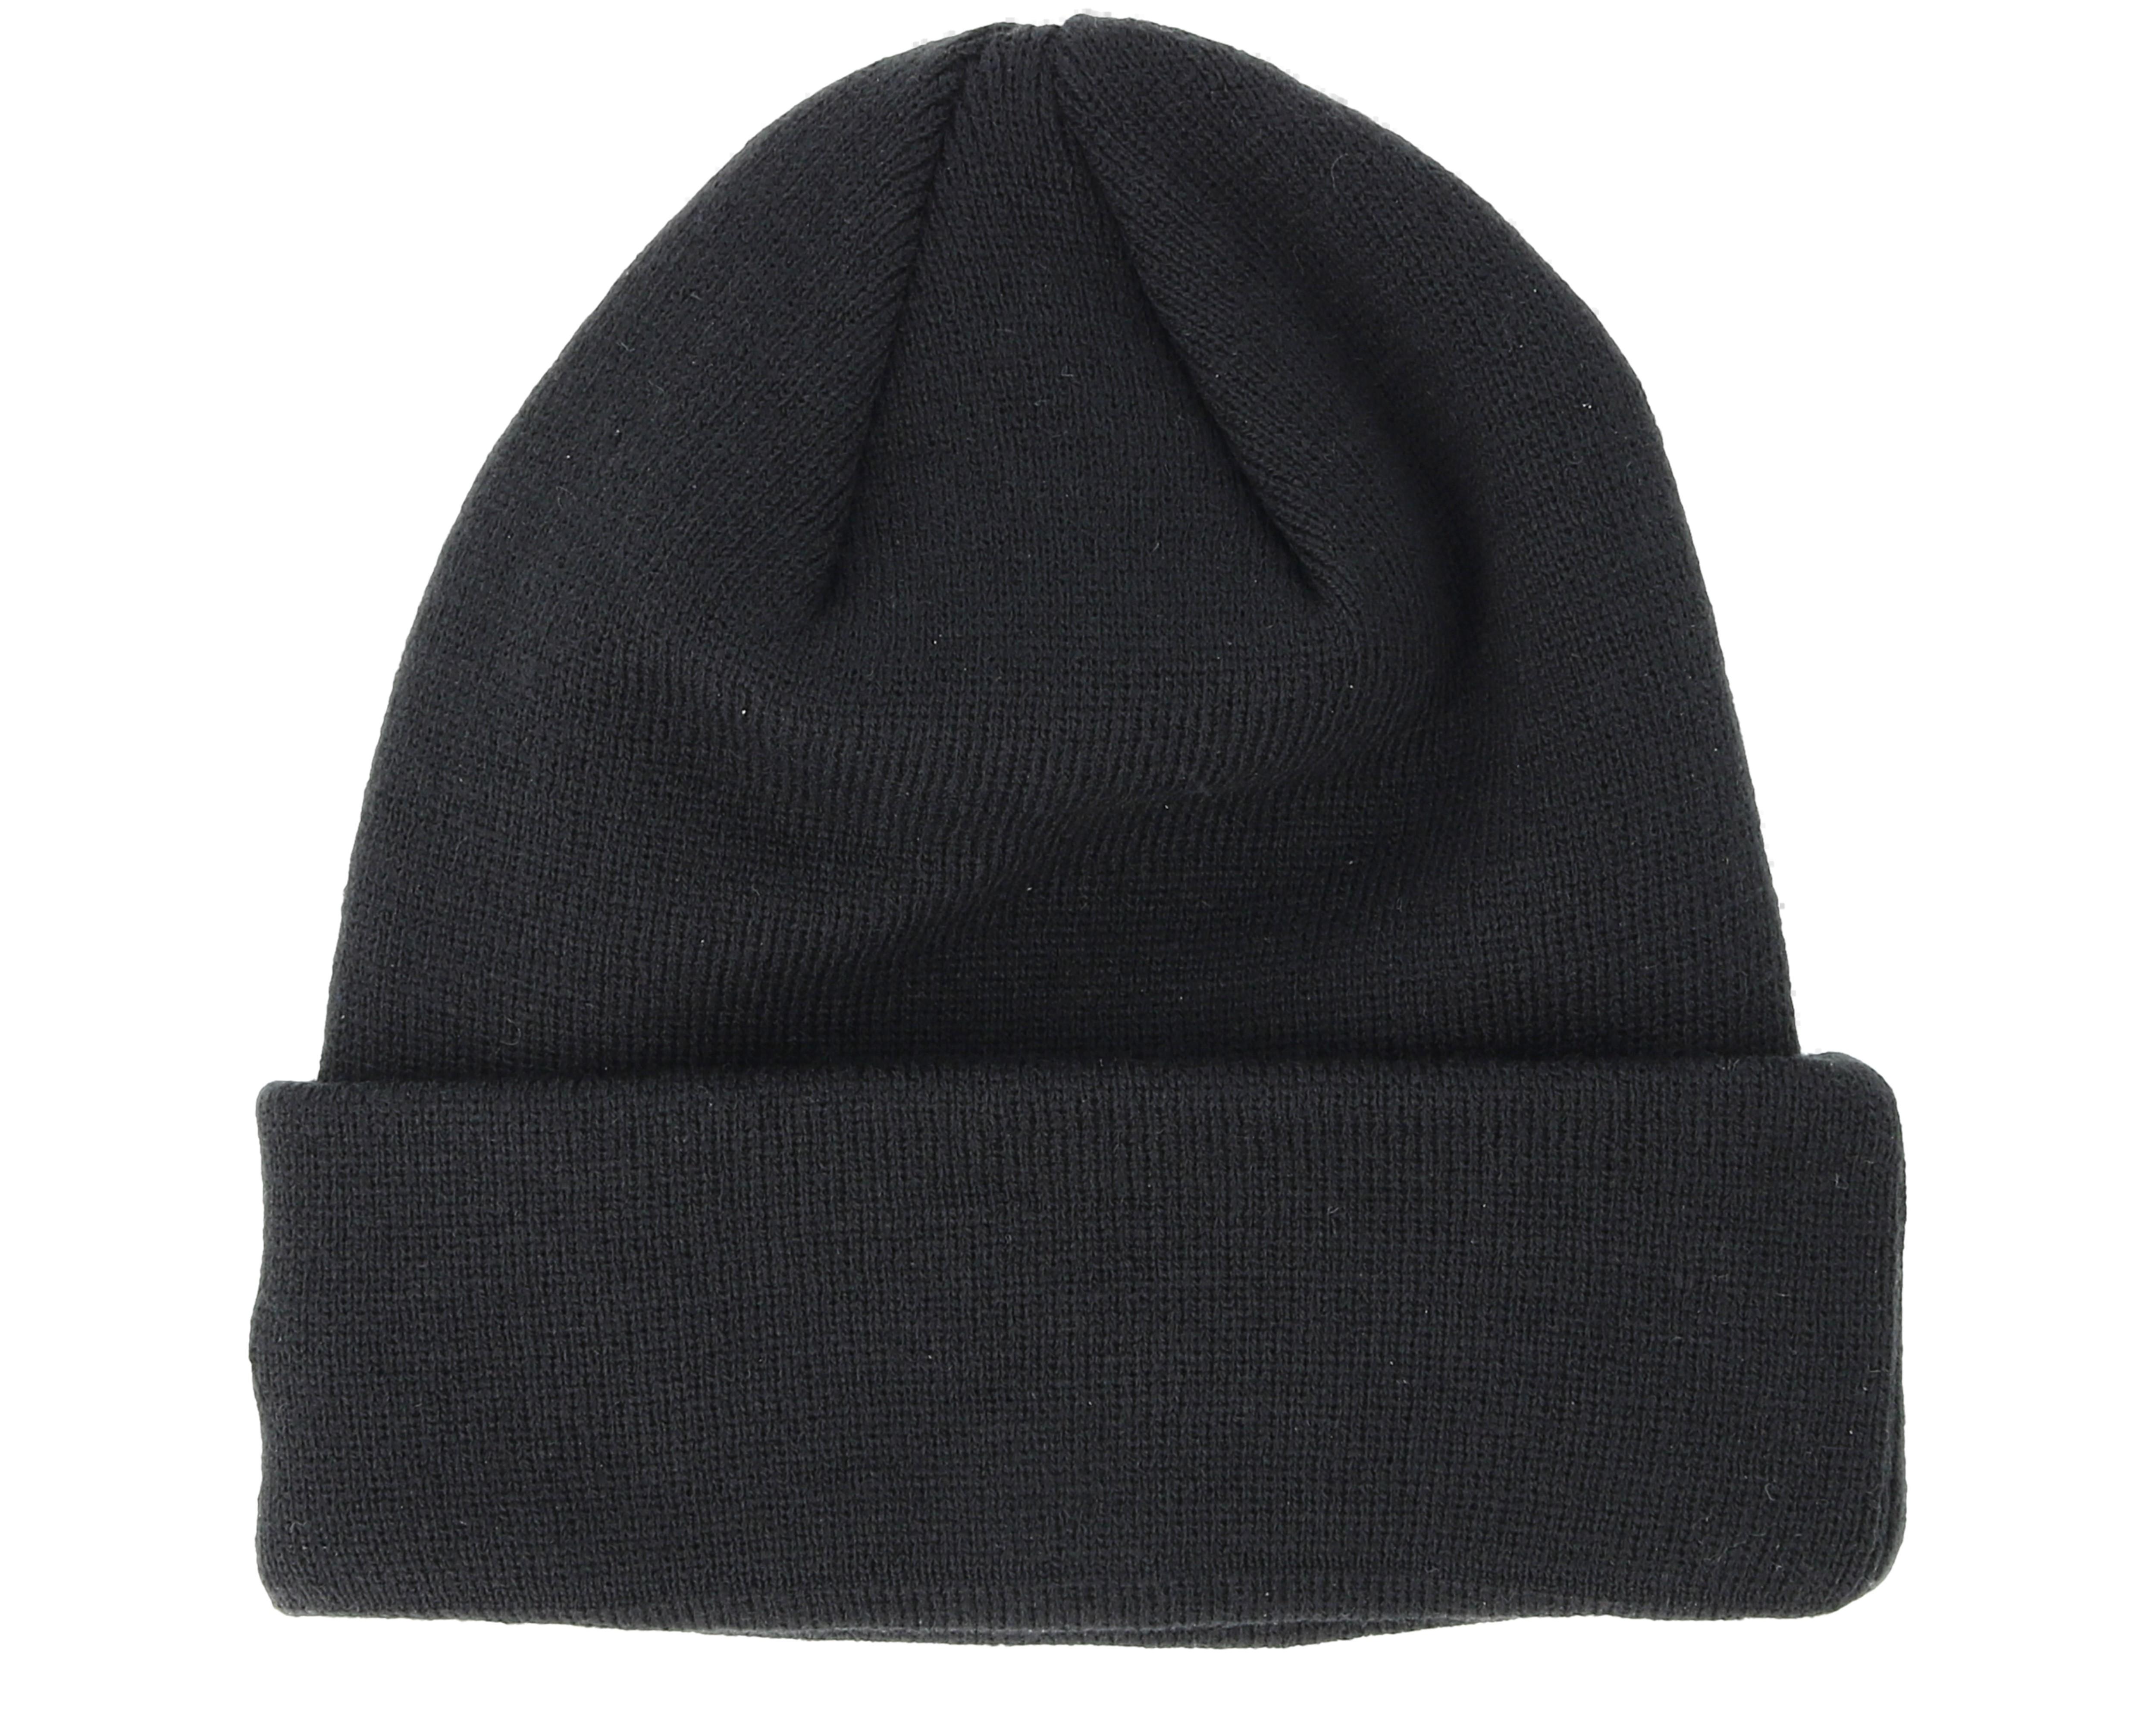 new york yankees satin patch knit black beanie new era. Black Bedroom Furniture Sets. Home Design Ideas